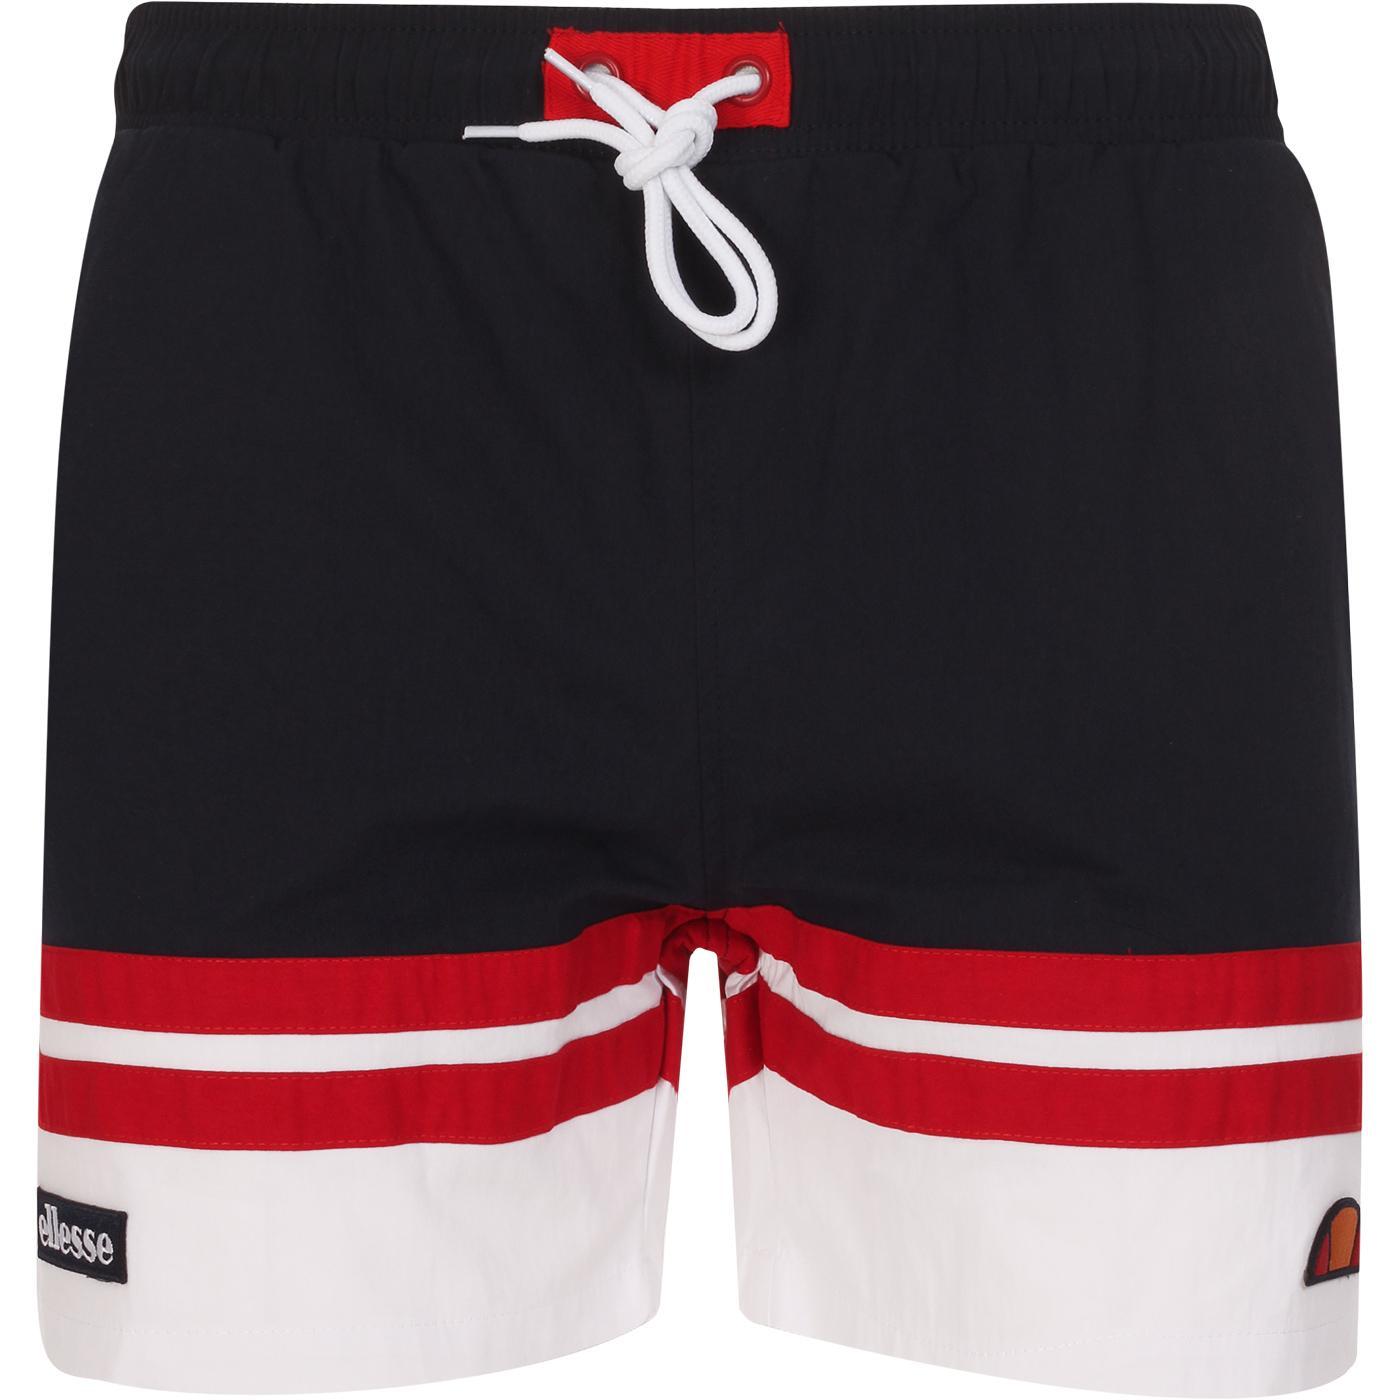 Cefalu ELLESSE Men's Retro Swim Shorts (N/W/R)